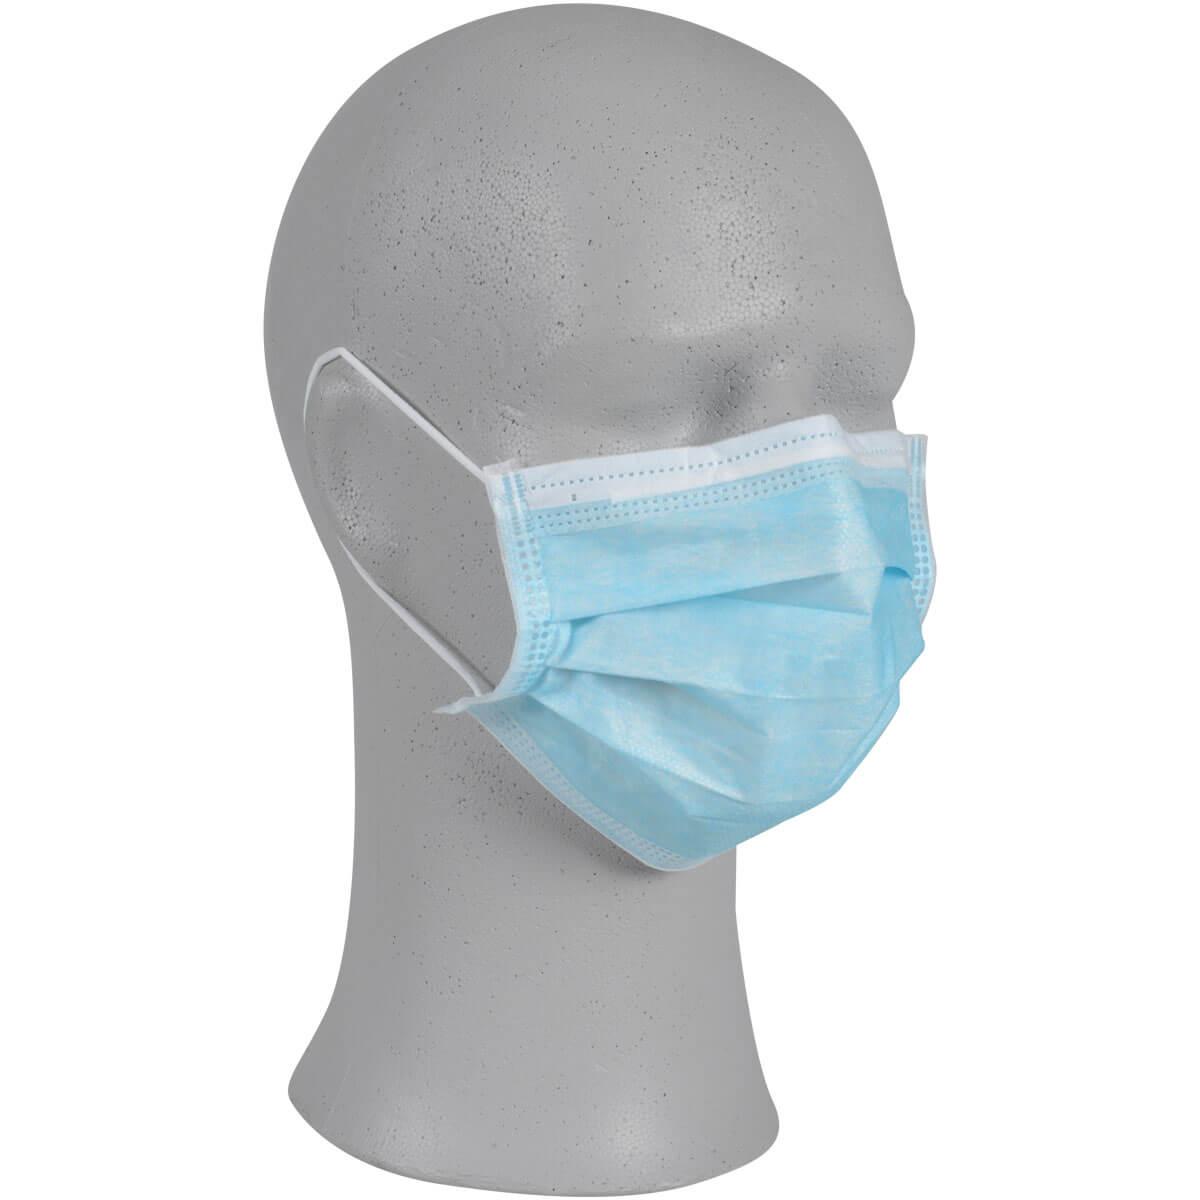 Medizinische Gesichtsmasken Typ IIR EN 14683